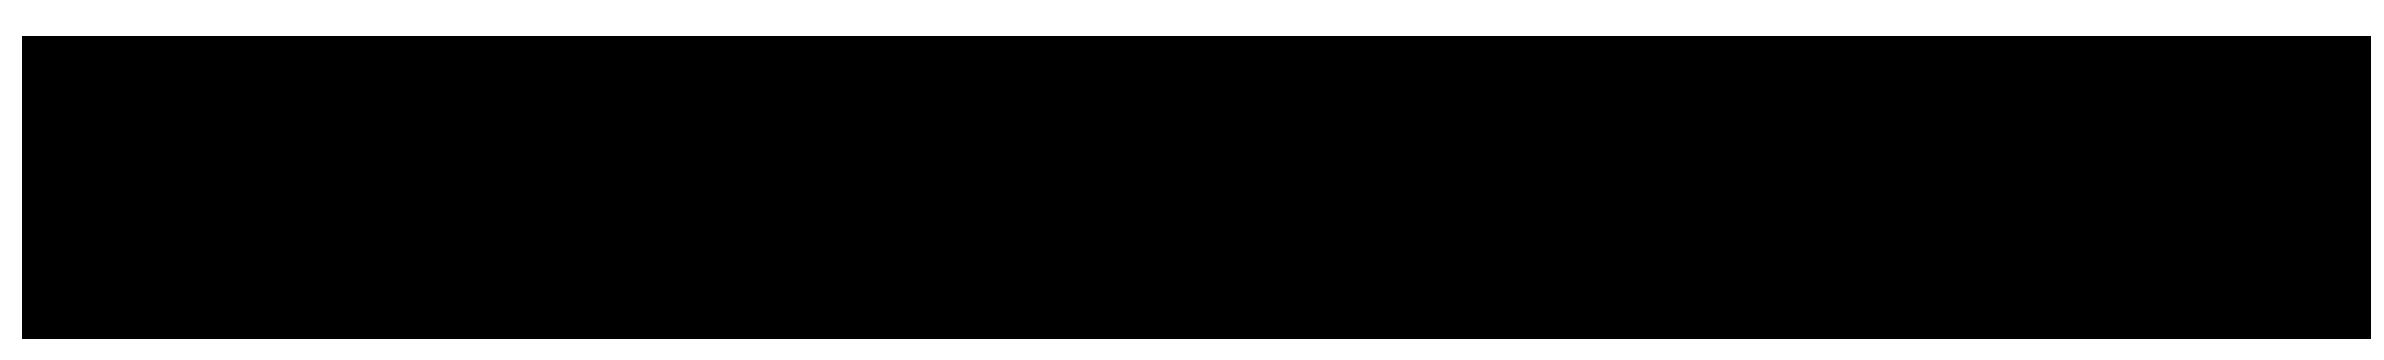 claudiavega